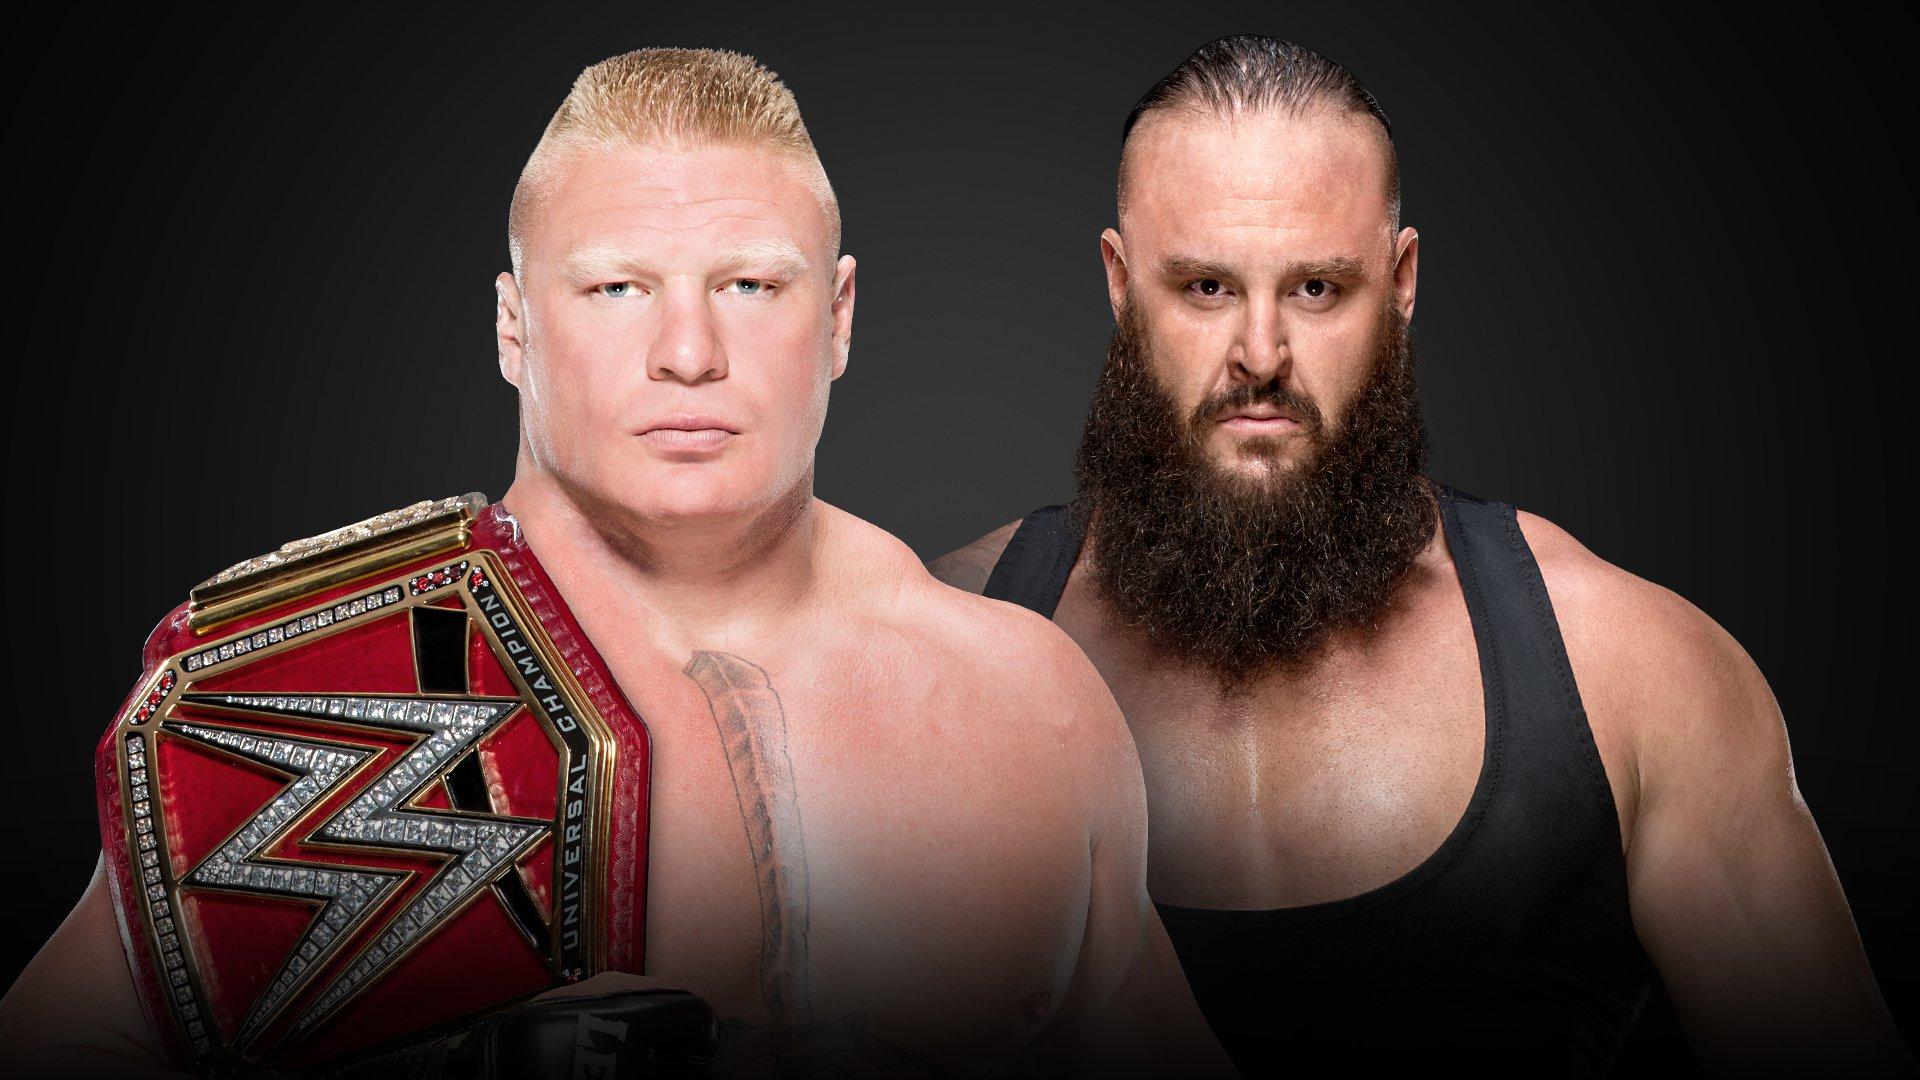 Znalezione obrazy dla zapytania PPV Royal Rumble 2019